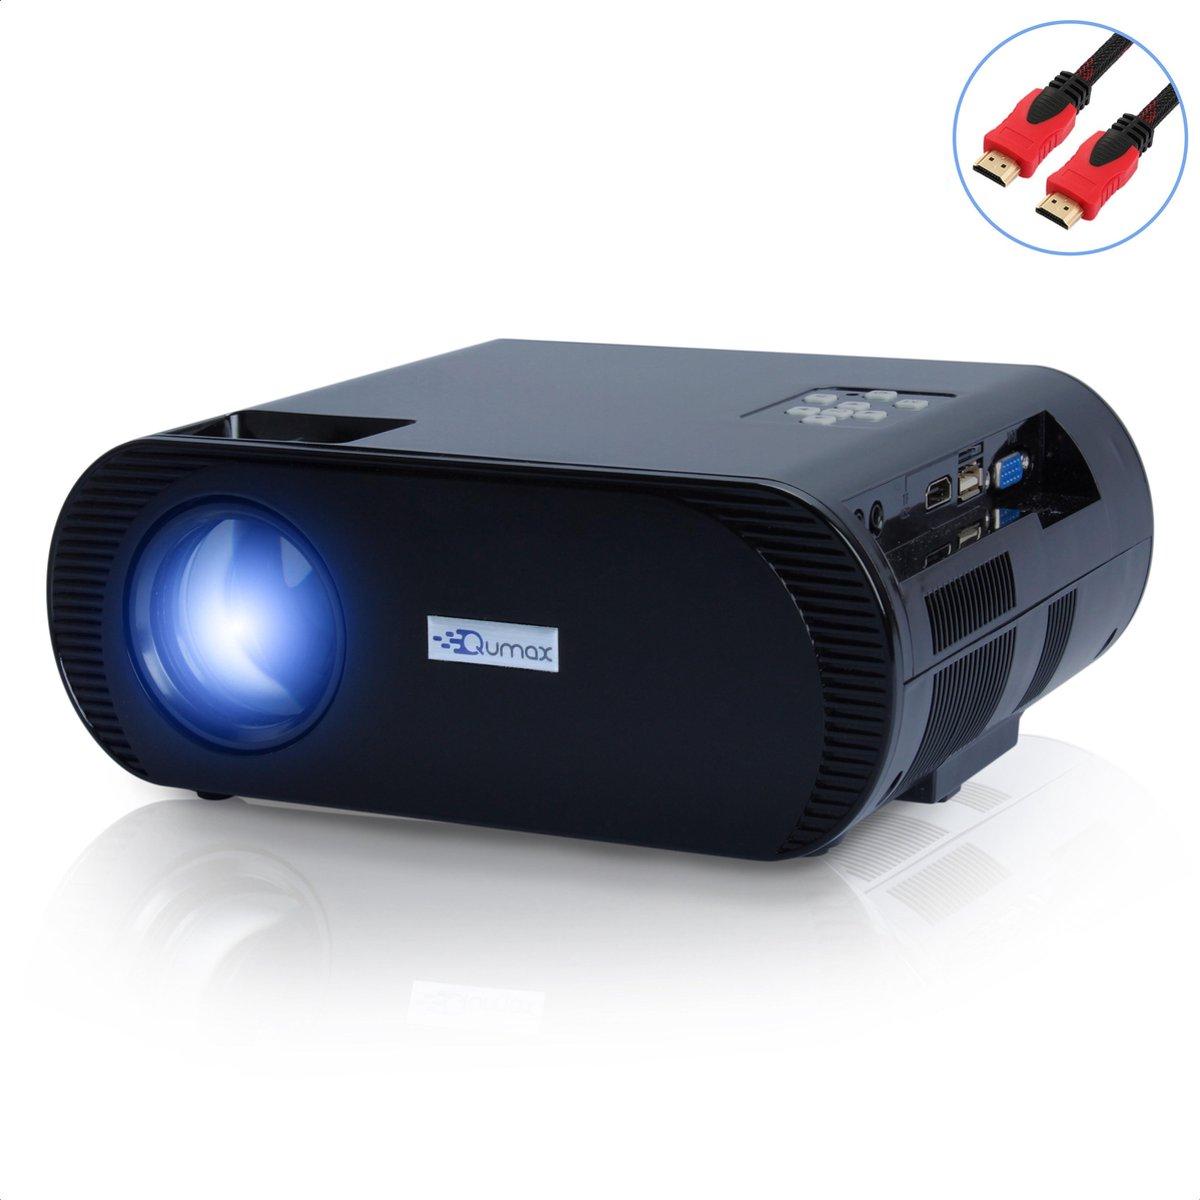 Qumax mini beamer met HDMI kabel - HD projector - Zwart